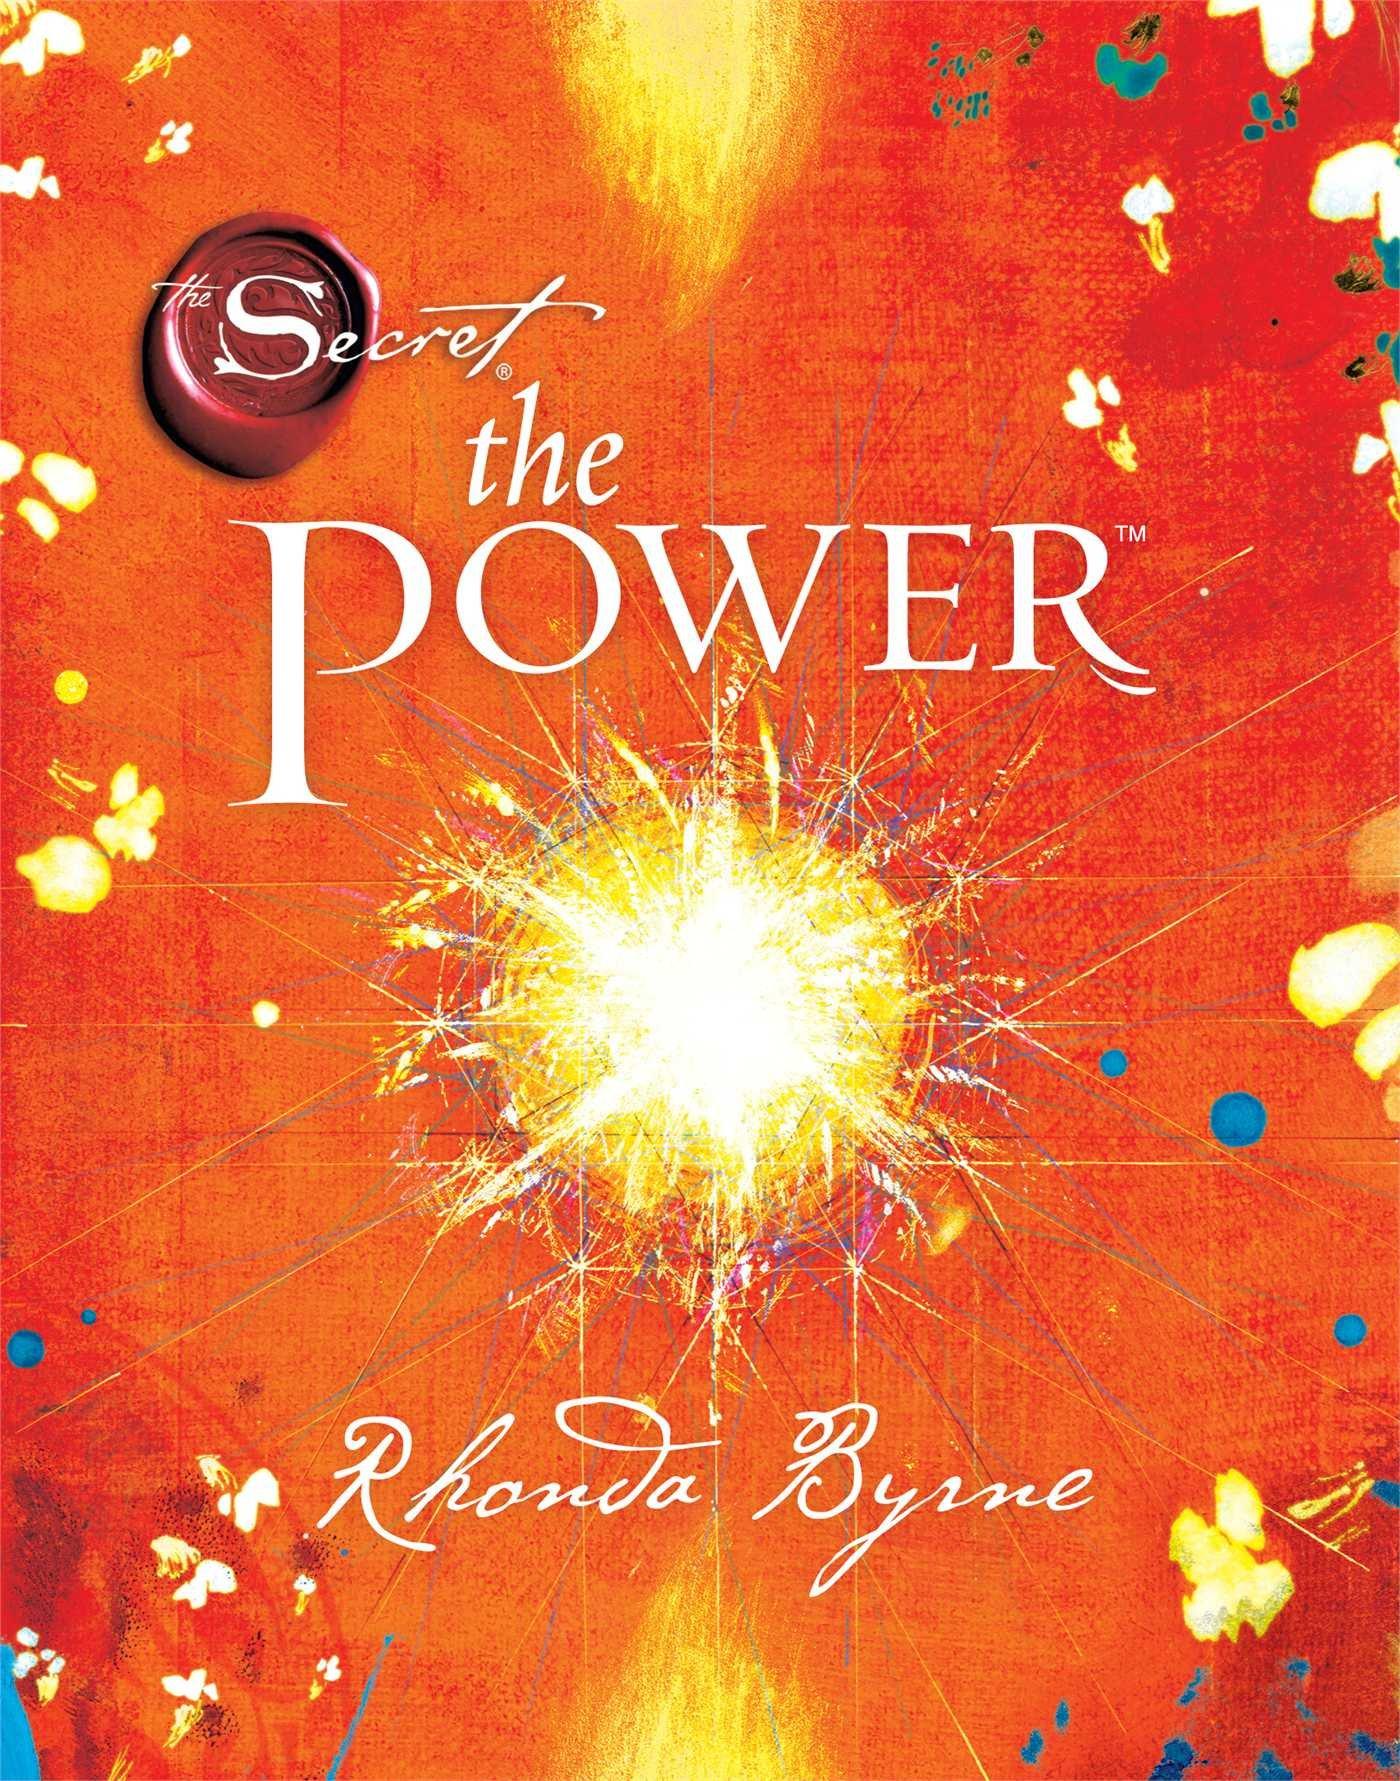 The Power (The Secret): Rhonda Byrne: 8601416203782: Amazon.com: Books